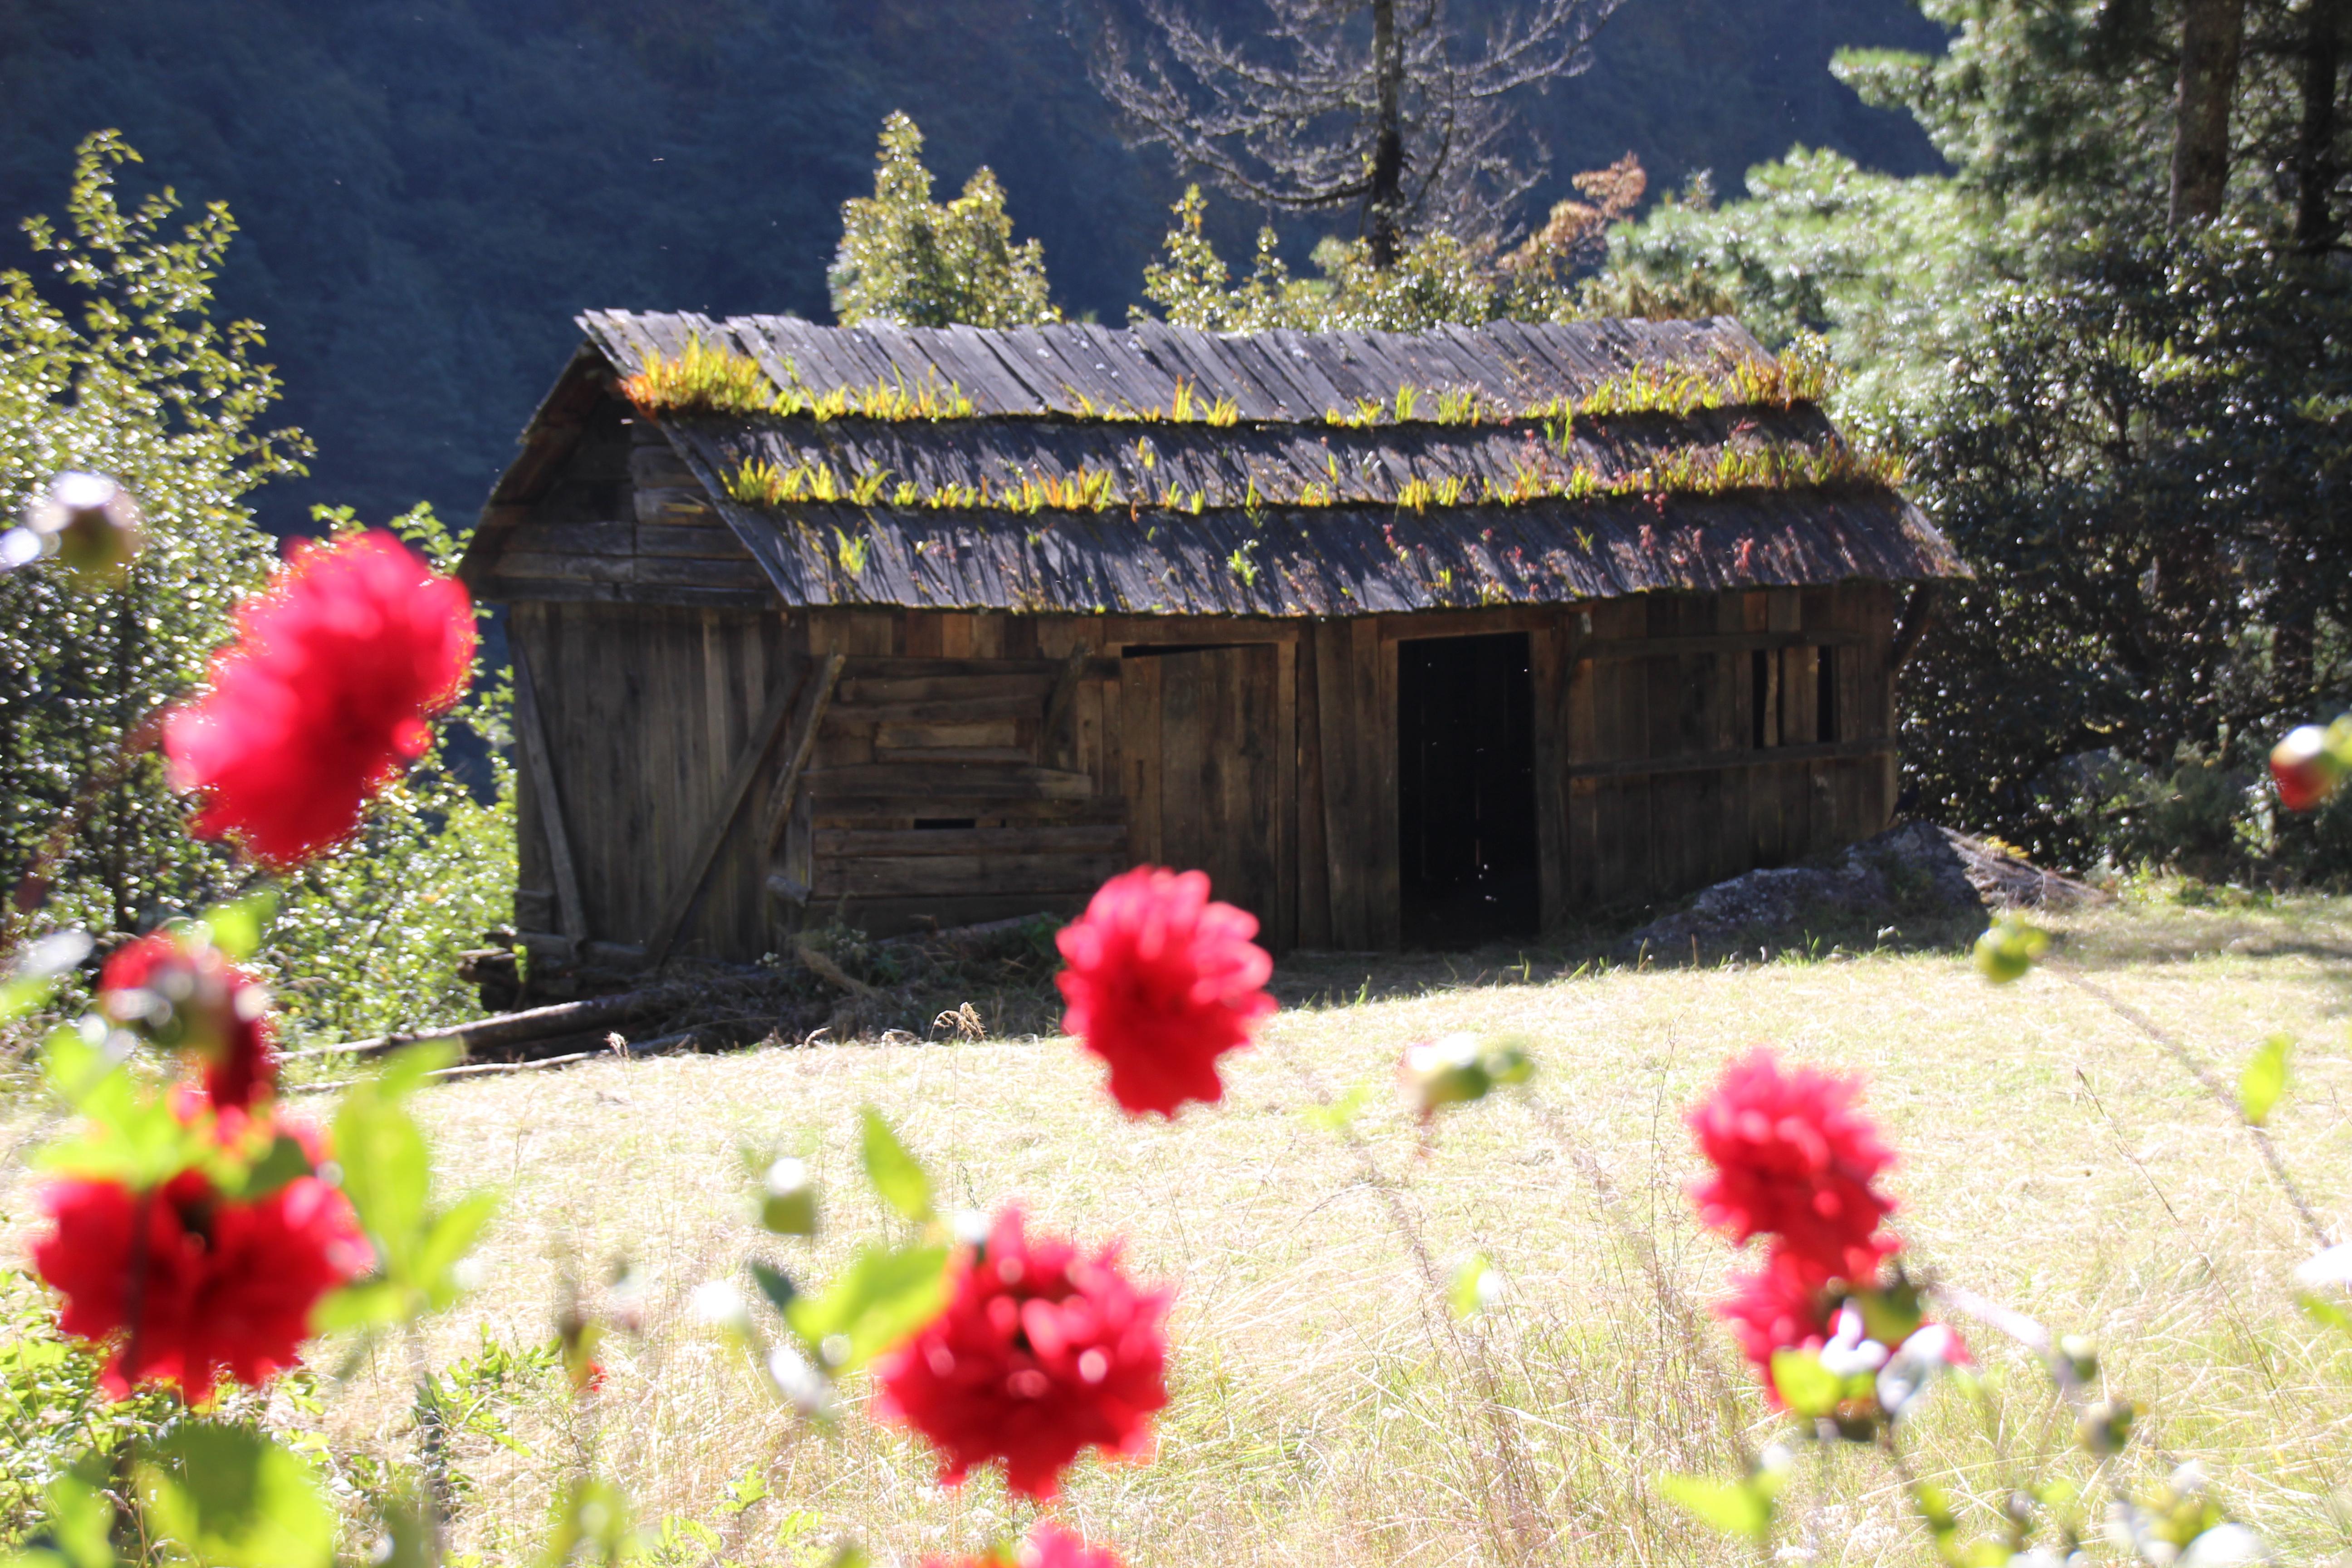 Old Local Farm House - Flowers